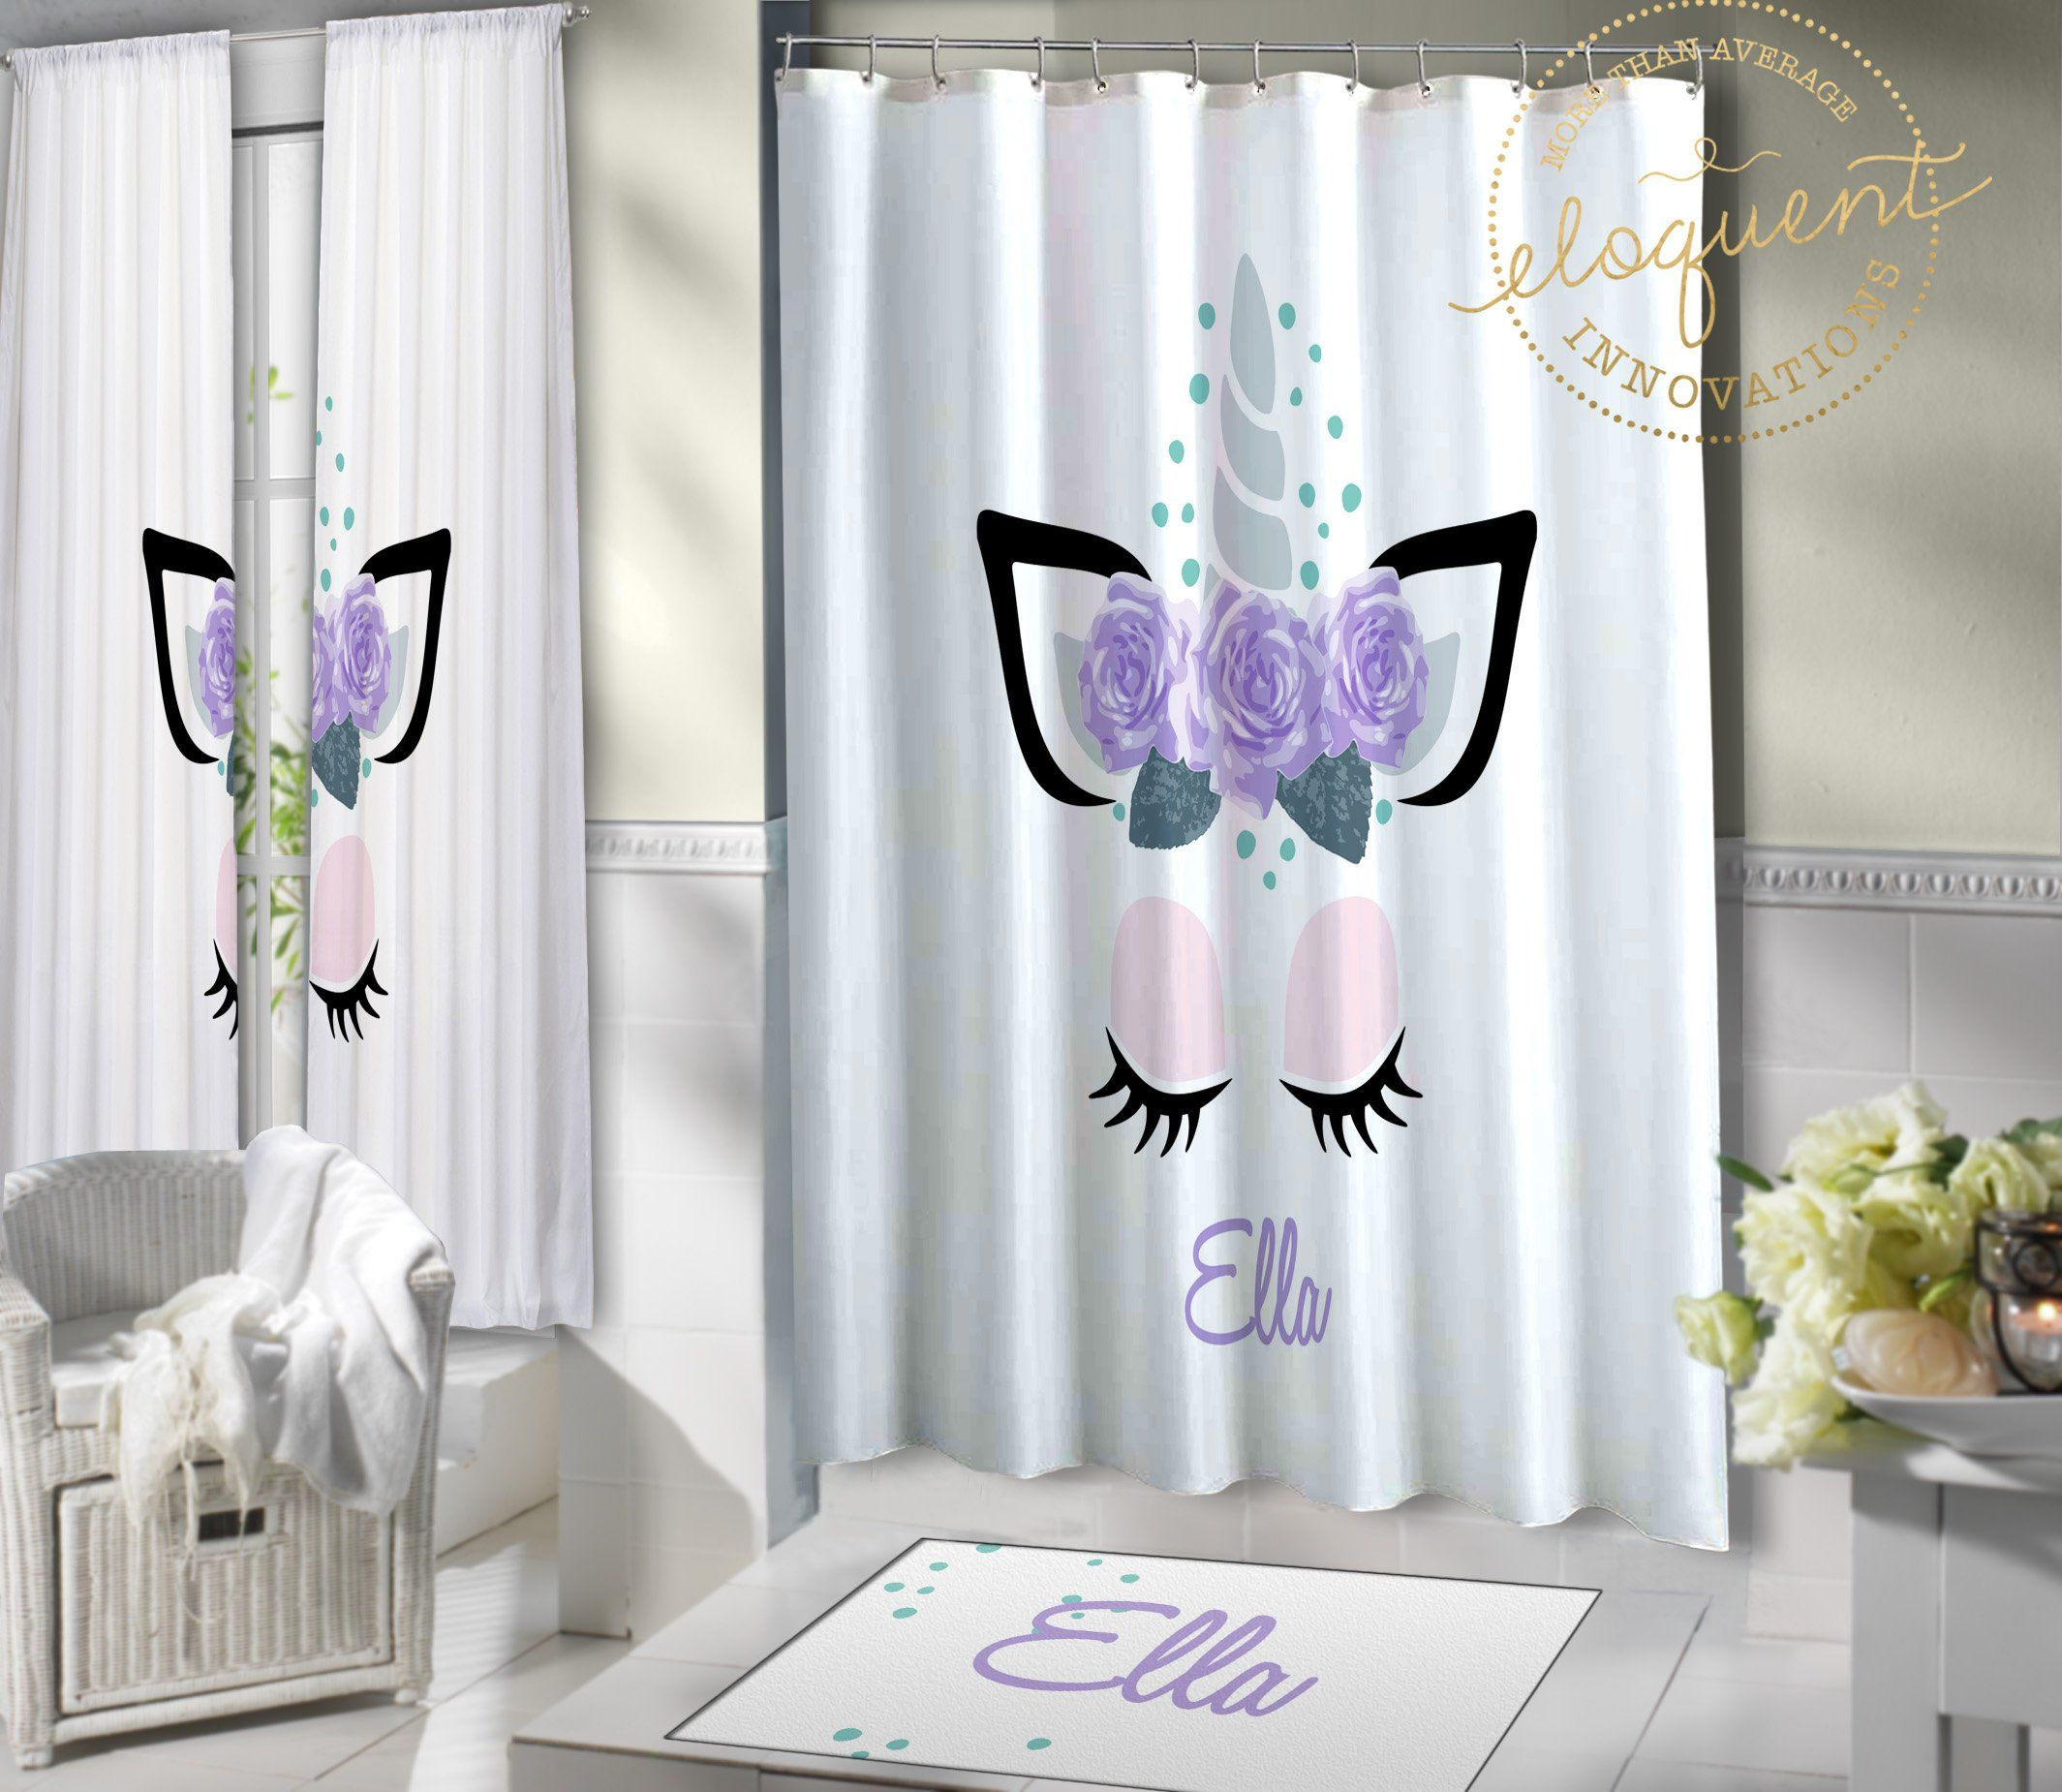 Unicorn Shower Curtain For Kids Bathroom Decor Bath Mat Girls Extra Long Fabric Shower Curtain Purple Kid Bathroom Decor Kids Curtains Girls Shower Curtain